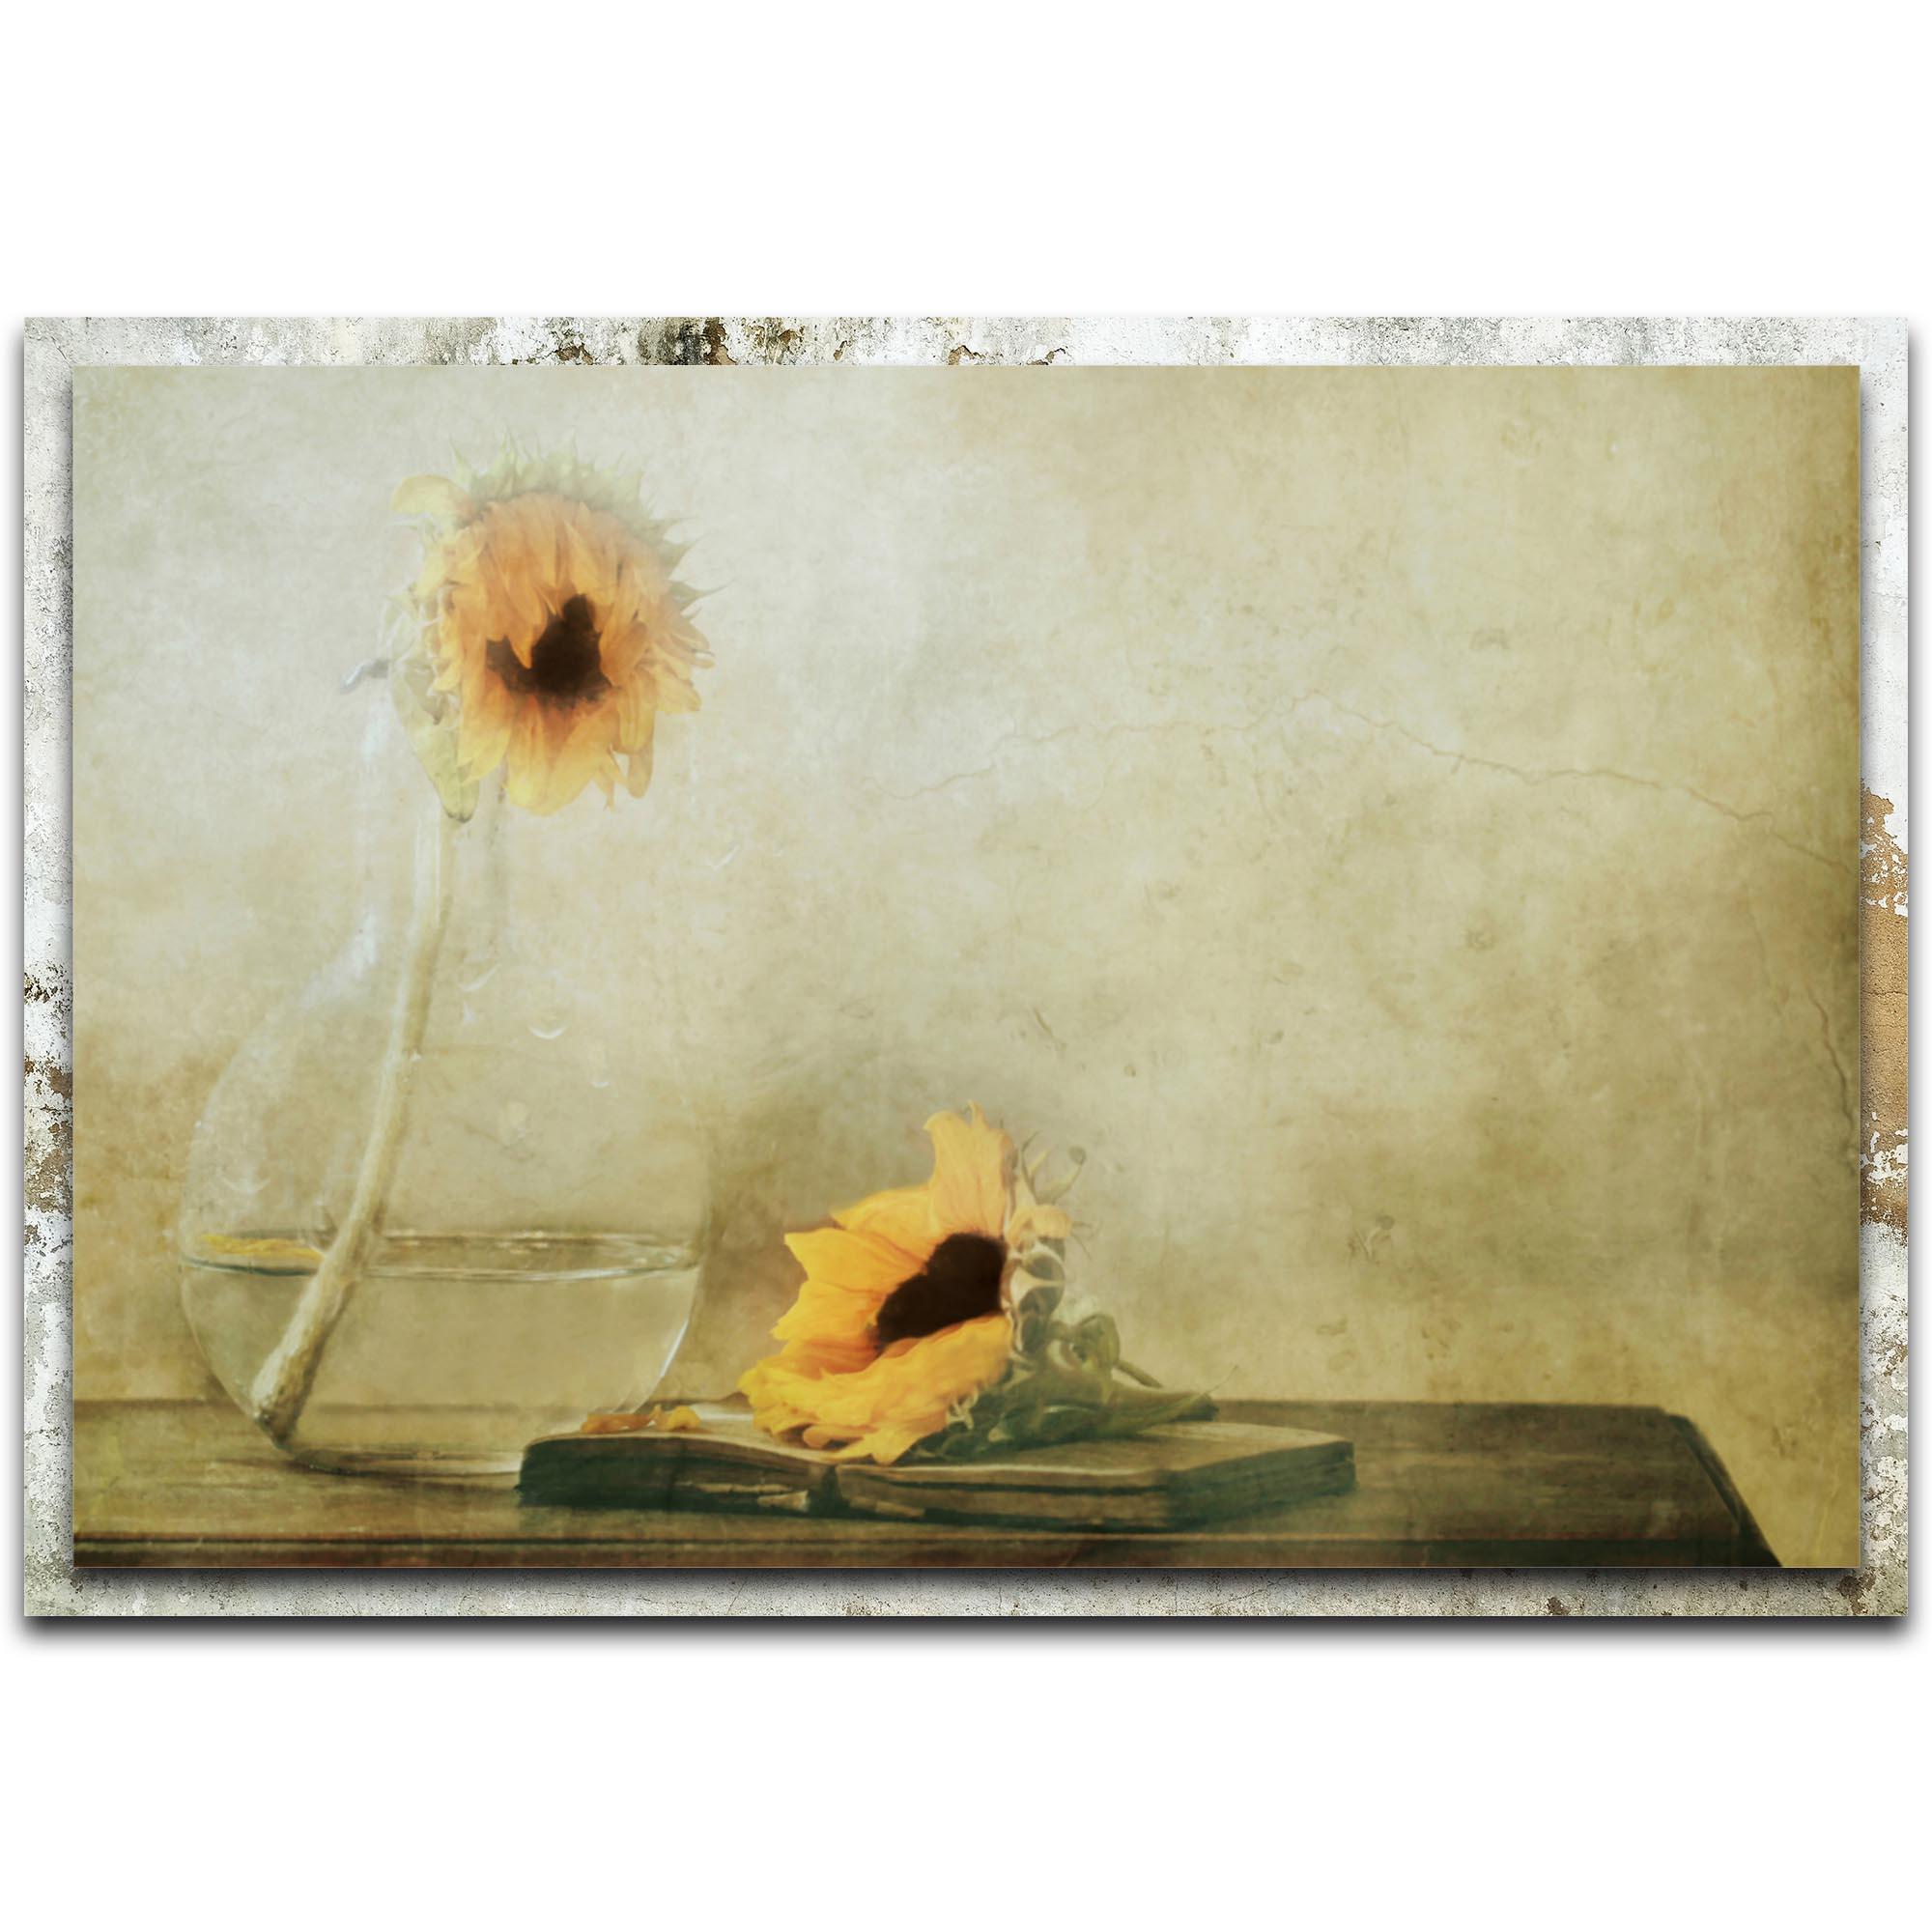 Delphine Devos 'The Black Heart' 32in x 22in Modern Farmhouse Floral on Metal